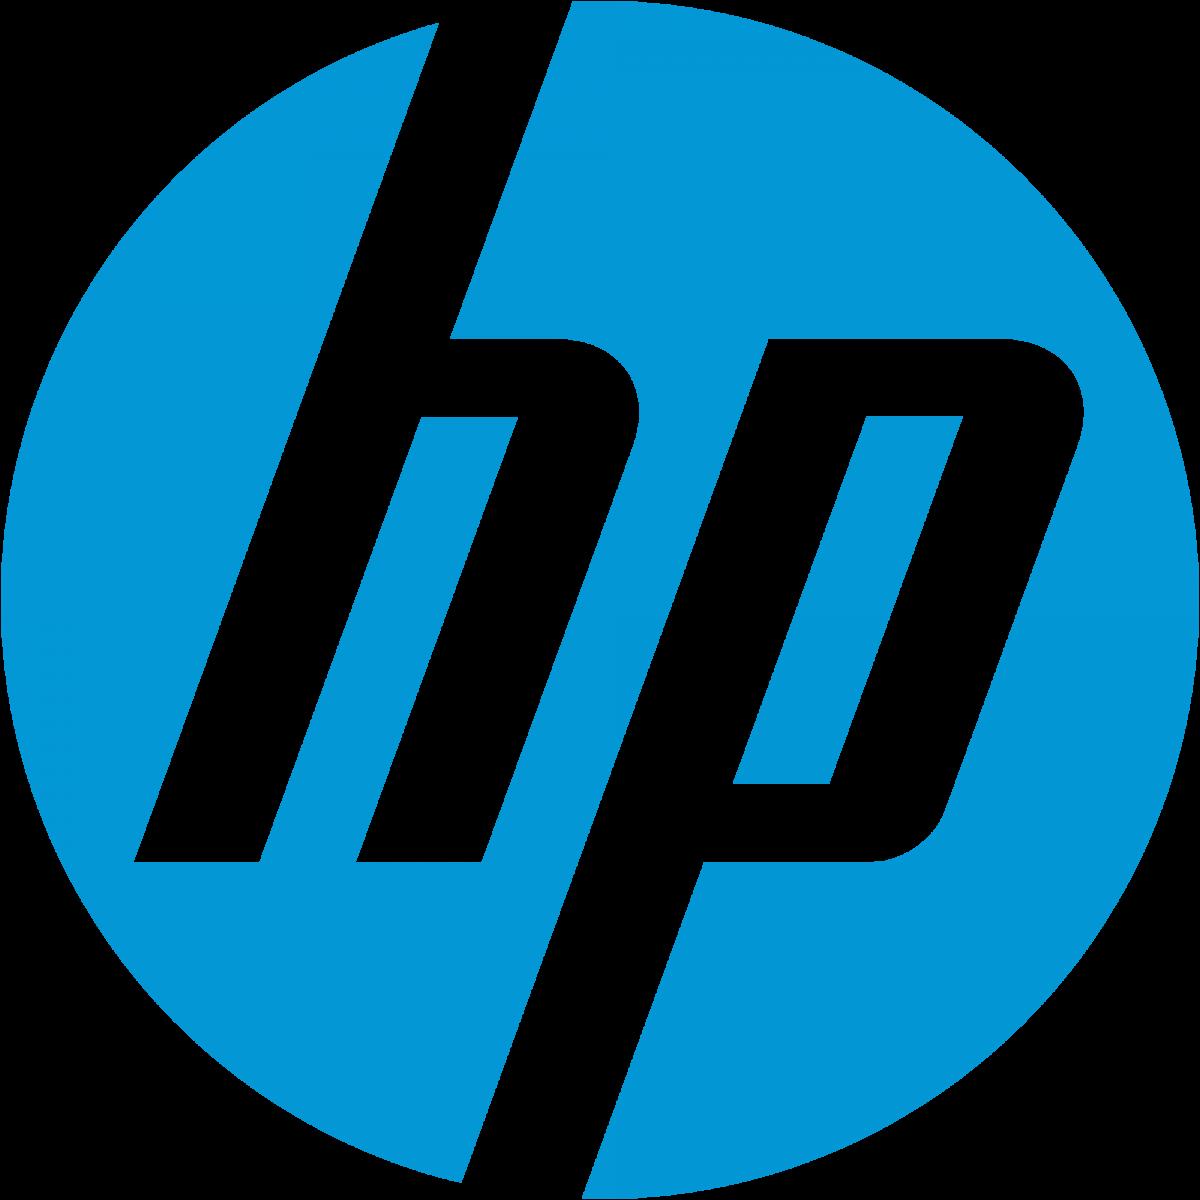 Switch HP V1910 JG538A 24 portas 10/100Mbps + 2x Gigabit Combo (RJ45/SFP) (Substitui JD990A)  - TNTinfo Loja